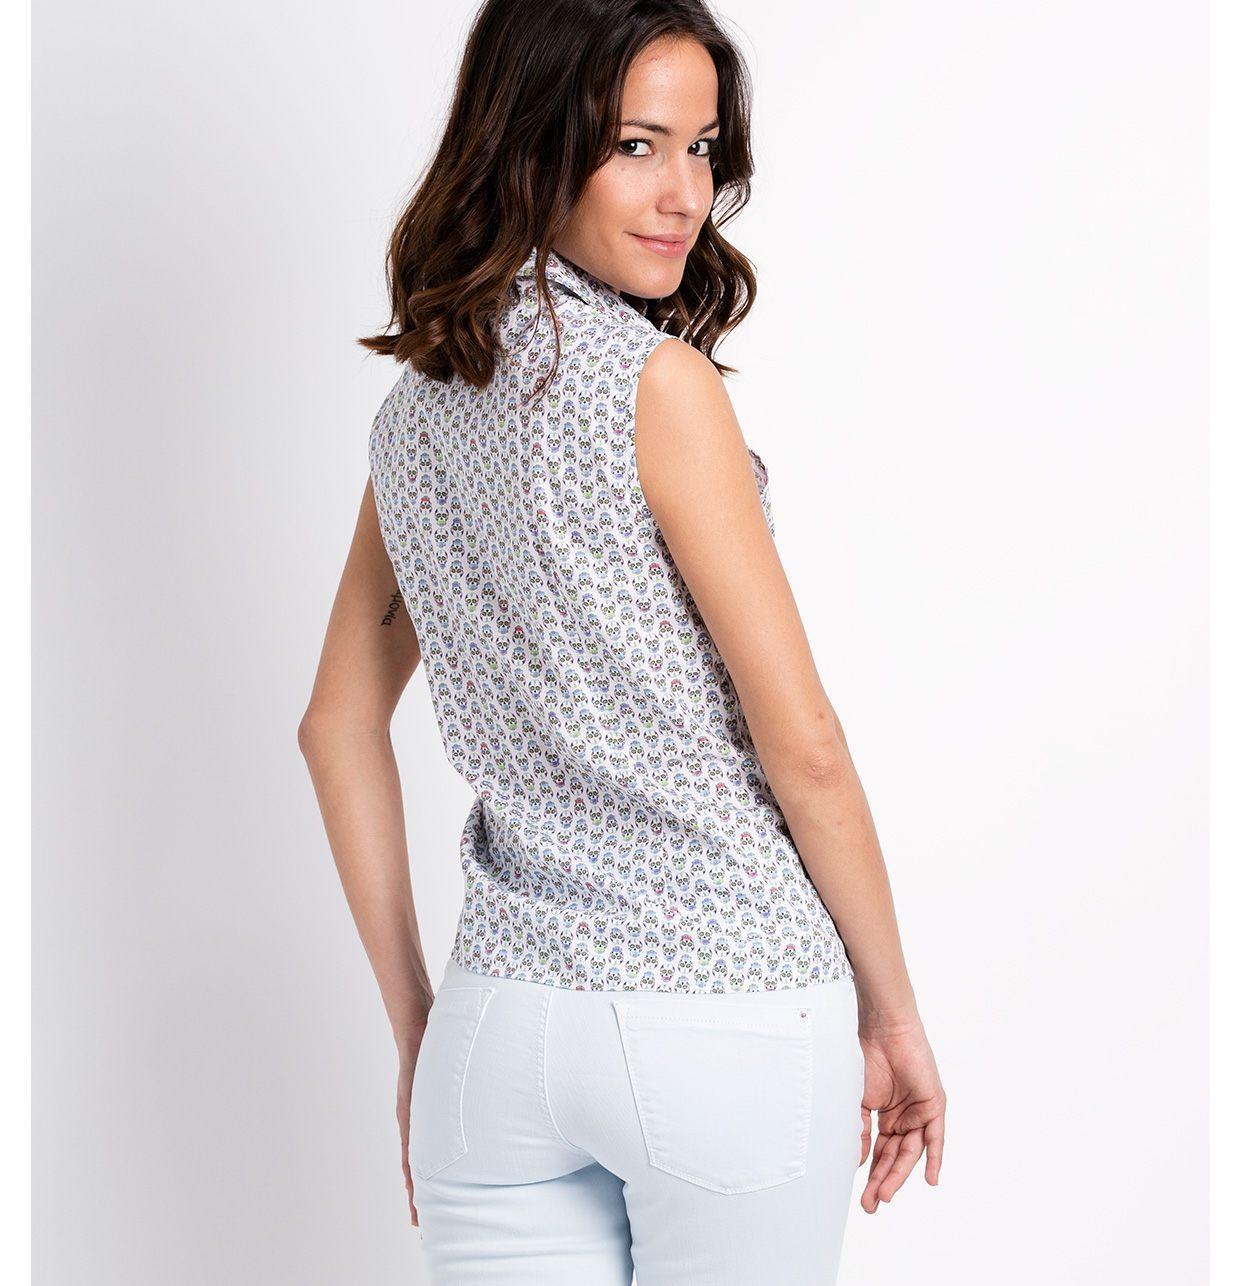 Camisa woman manga sisa, modelo ADA estampado de calaveras color crudo 100% Algodón